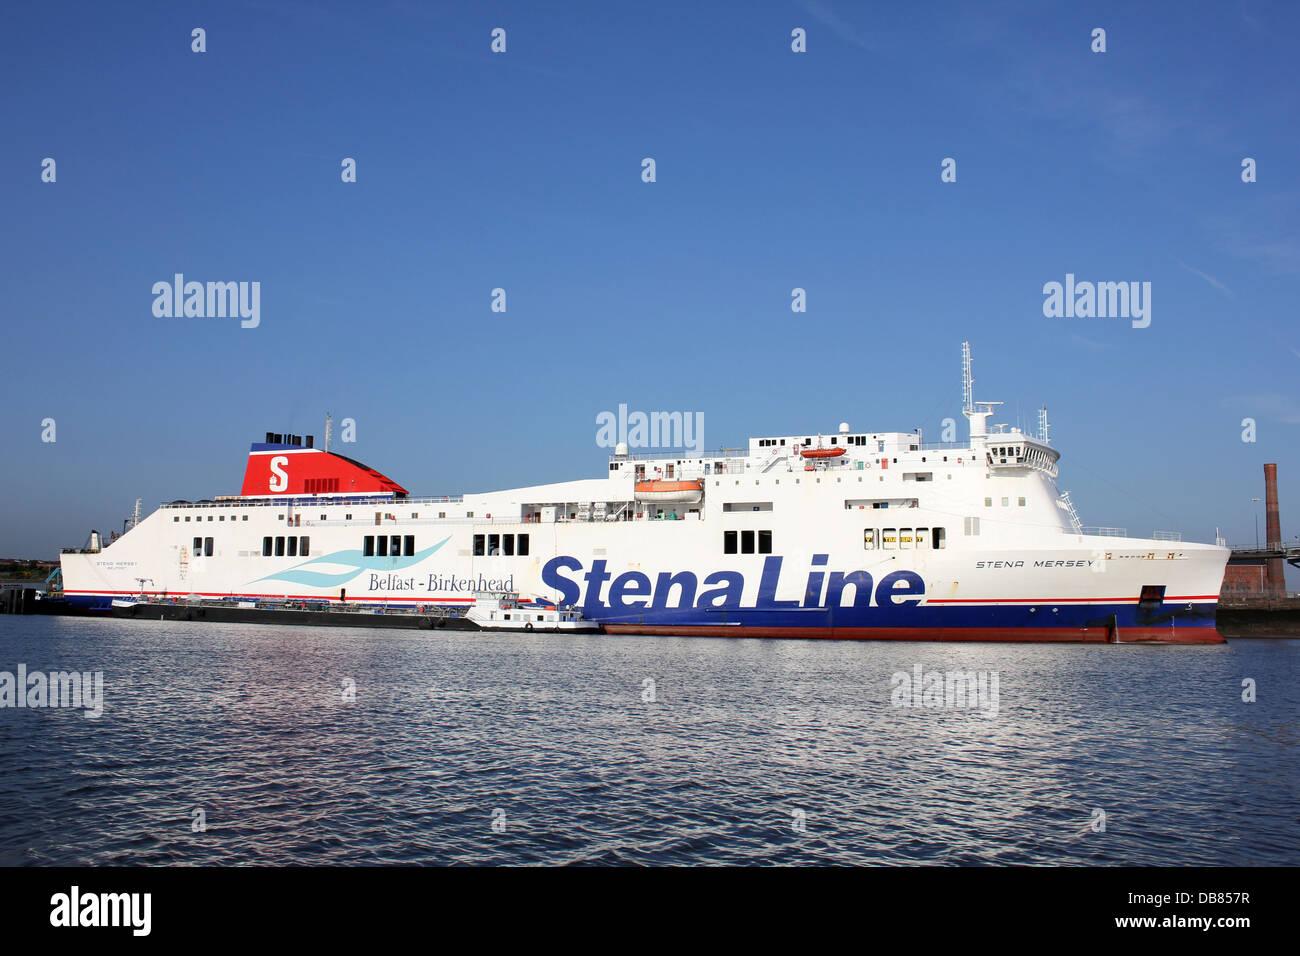 Stena Line Belfast to Birkenhead Ferry - Stock Image